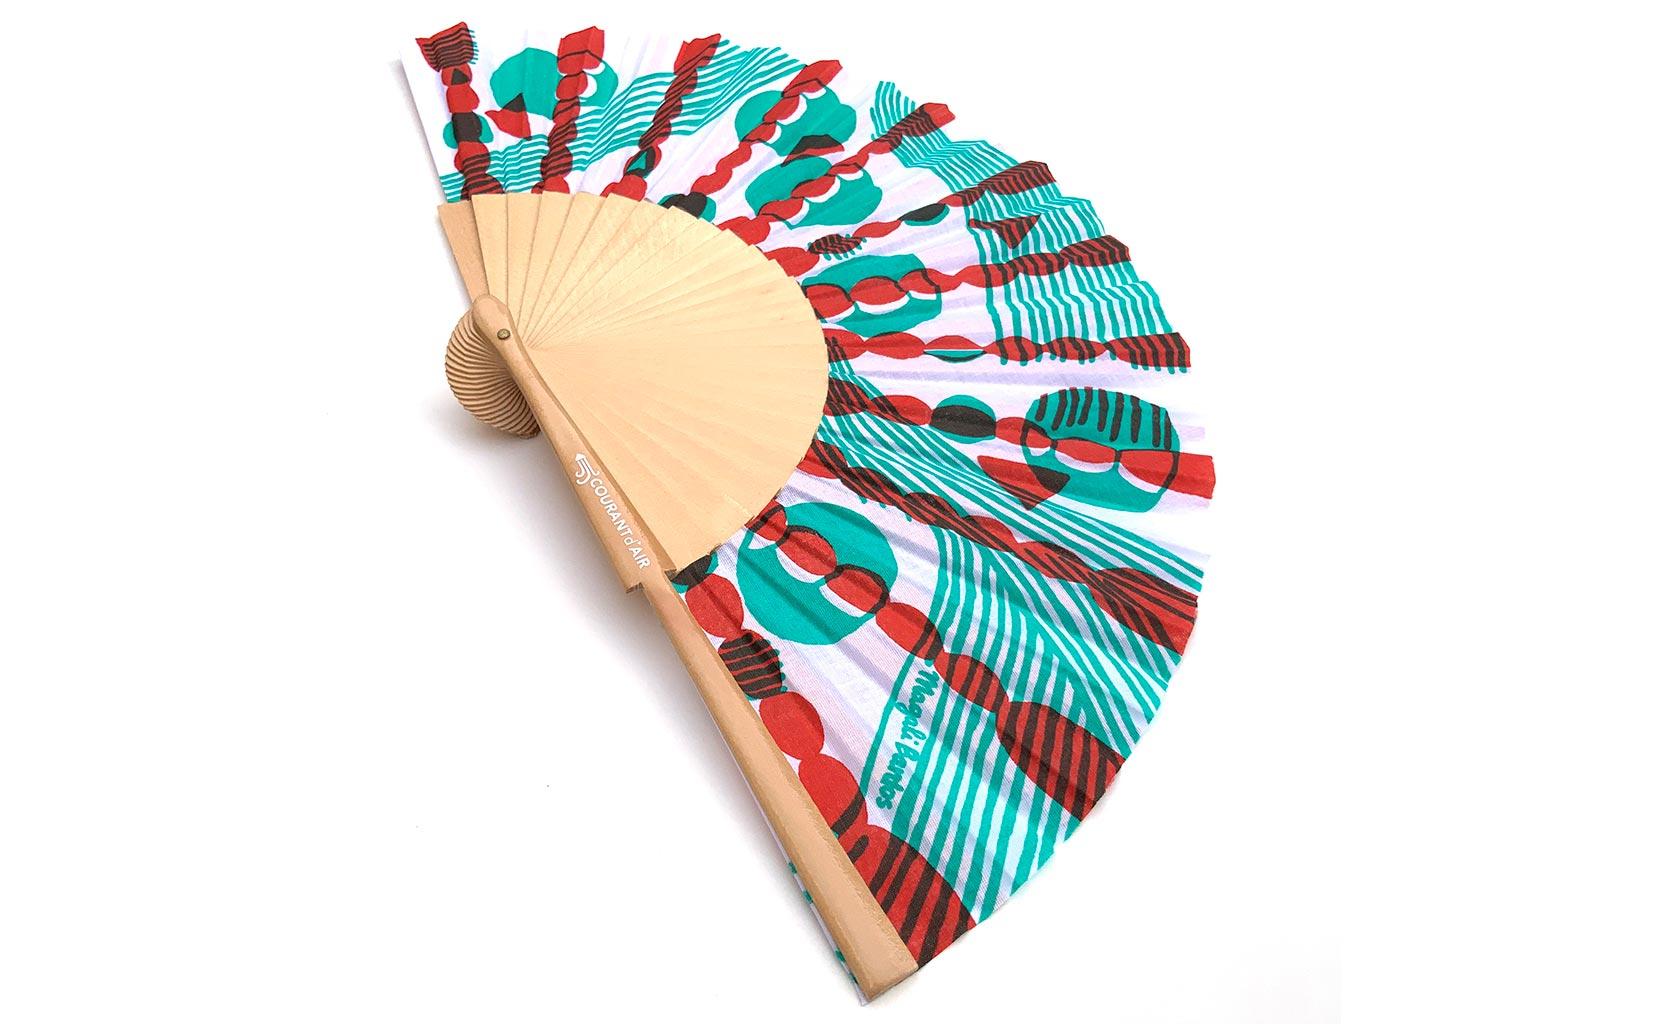 © courant d'air 02 © MagaliBardos éventail handfan motif pattern sérigraphie sur tissus silkscreen vert rouge